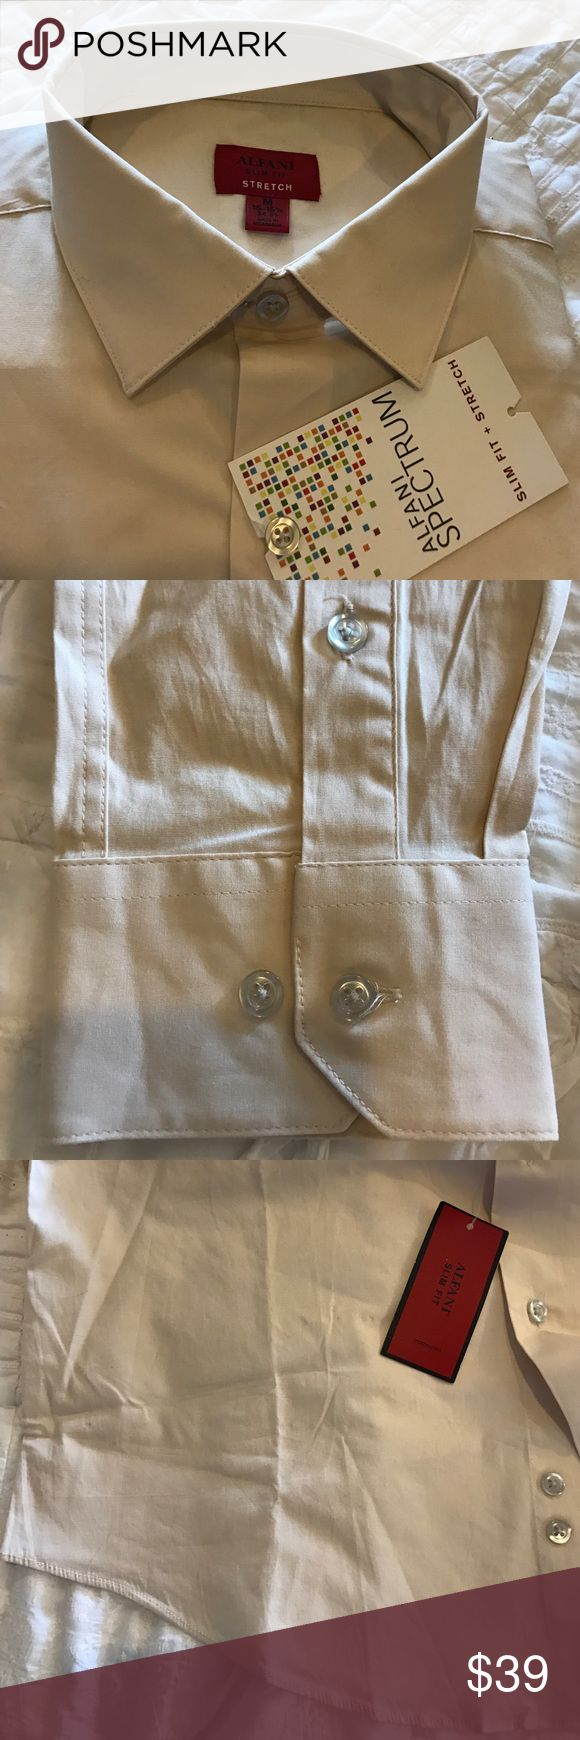 Alfani Men's Slim Fit Dress Shirt, Antique White. Alfani Men's Slim Fit Dress Shirt, Antique White (tan) Size 15-15.5 34/35 Medium. 97% cotton 3% spandex. Alfani Shirts Dress Shirts